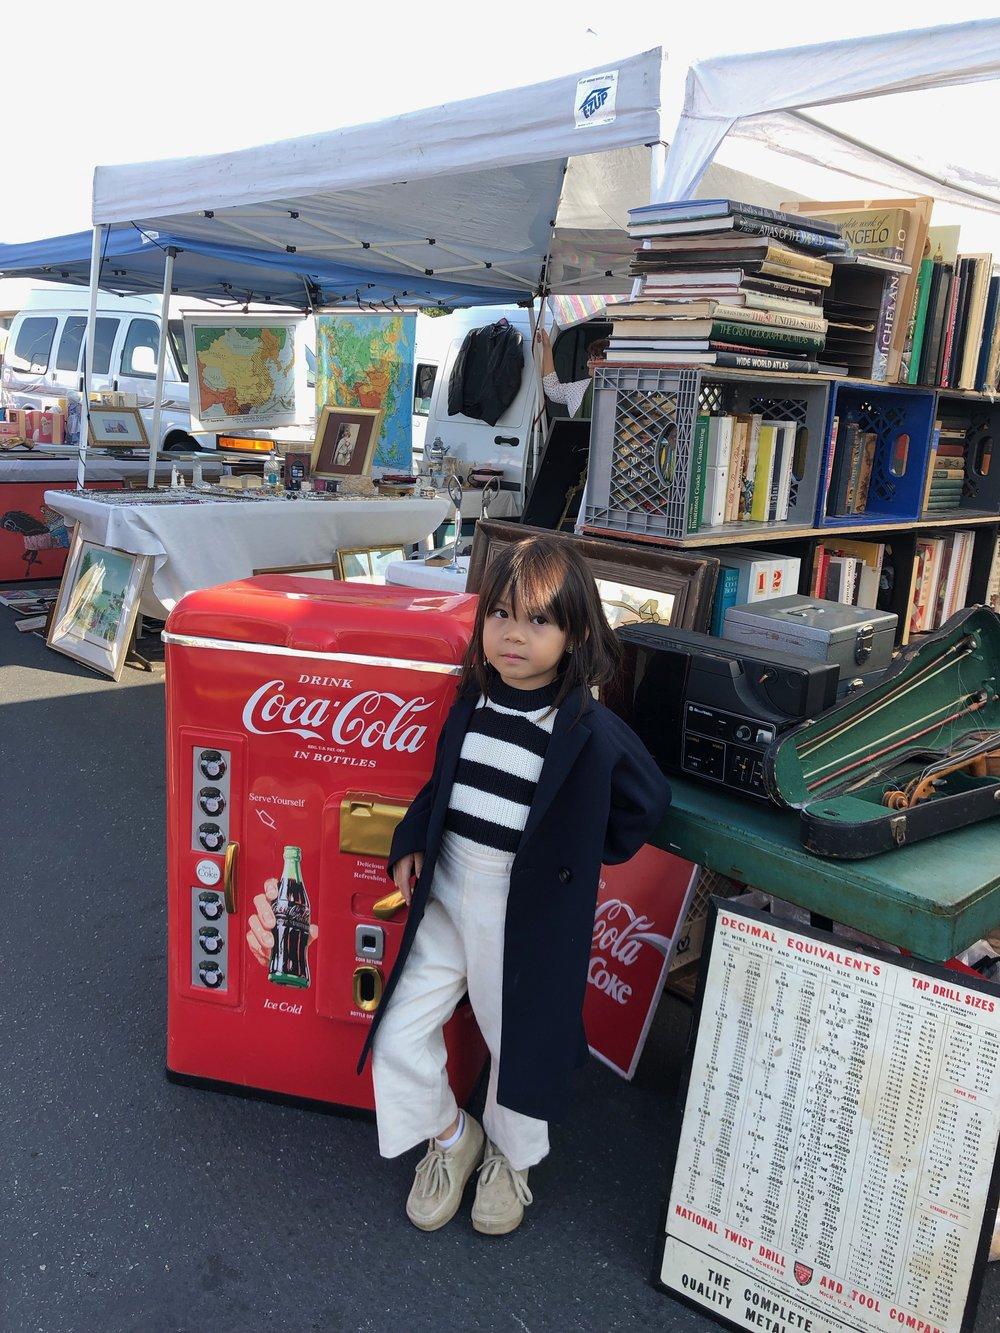 Long Beach Antique Market on meethaha.com